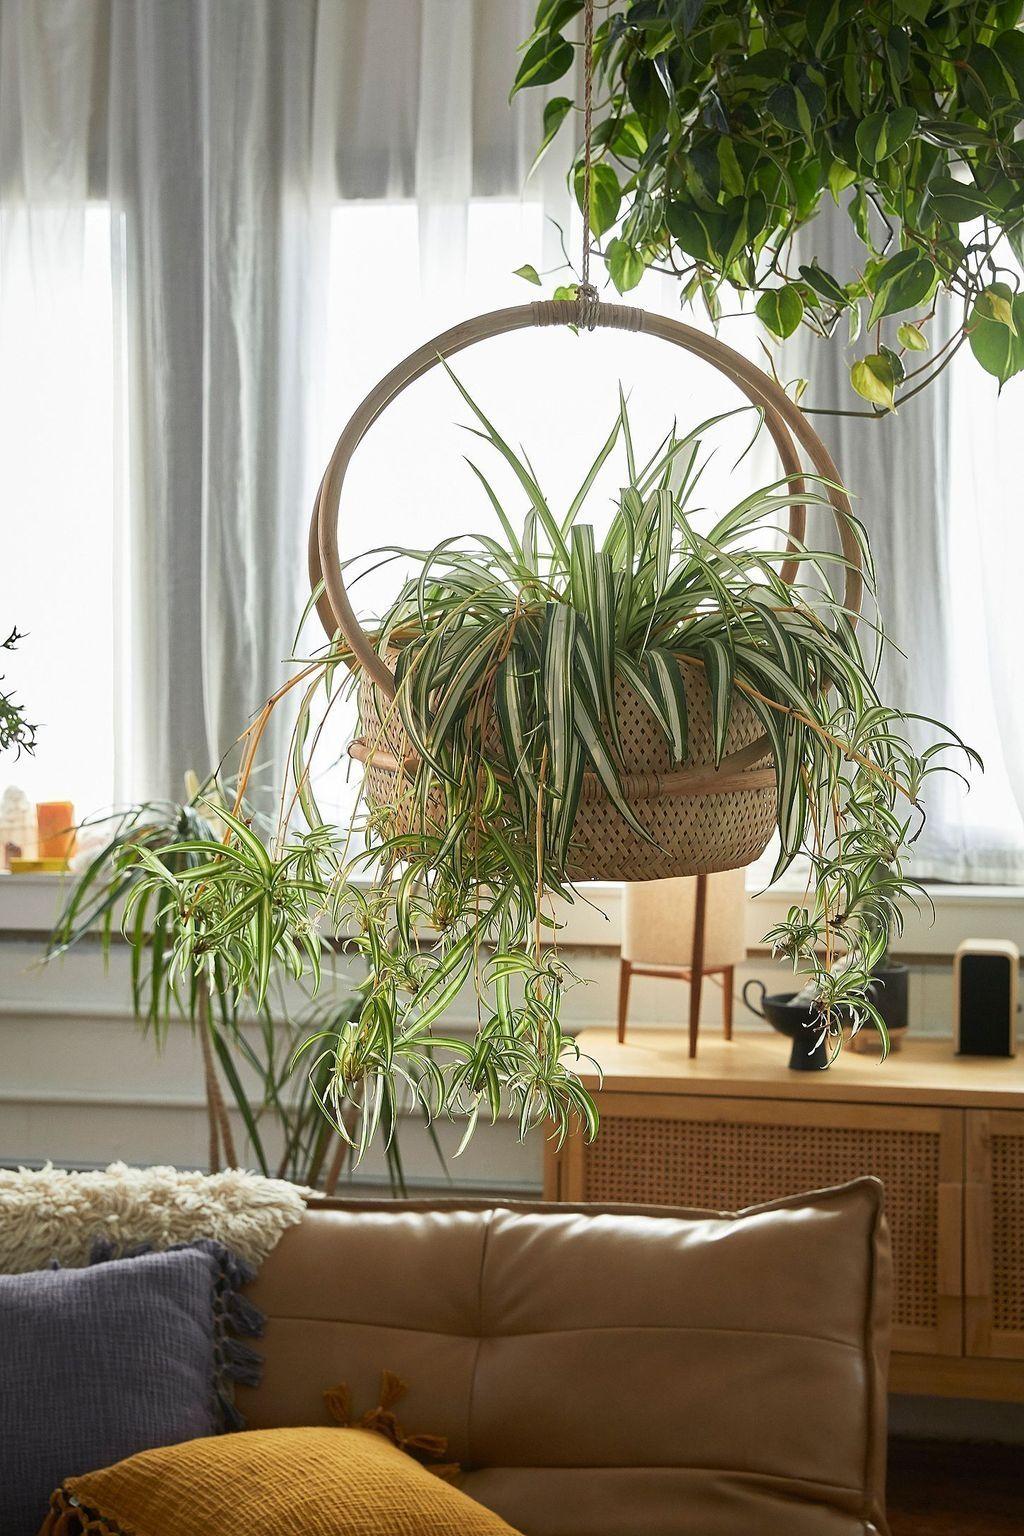 Hanging Planters Plants